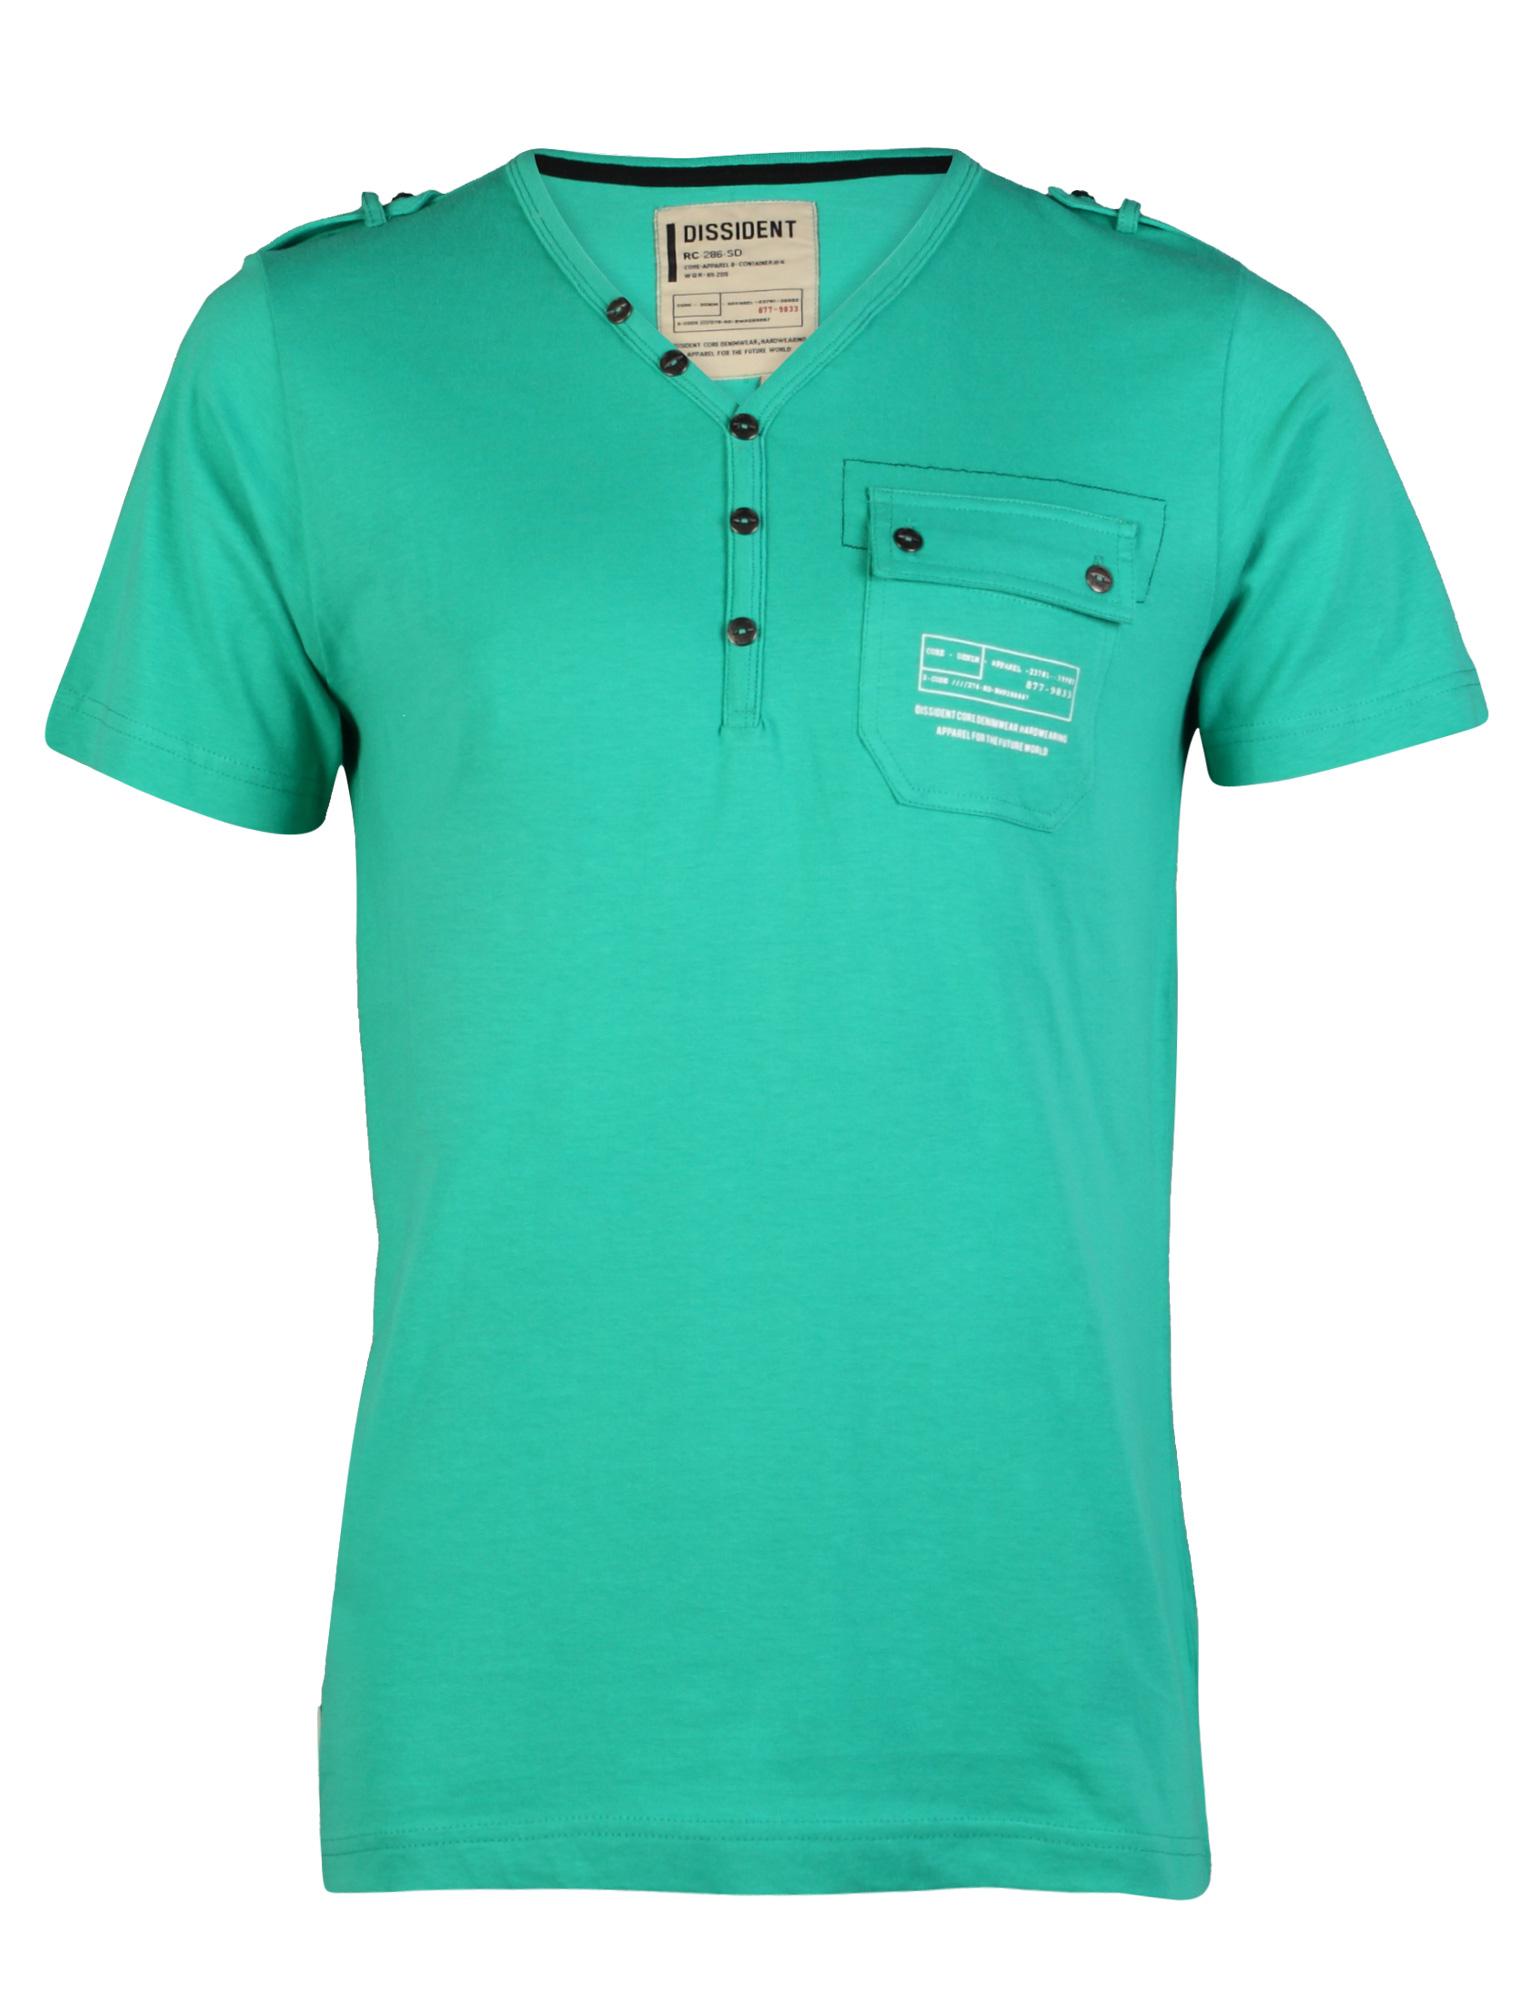 New mens dissident fender henley t shirt chest pocket for Mens xl tall henley shirts